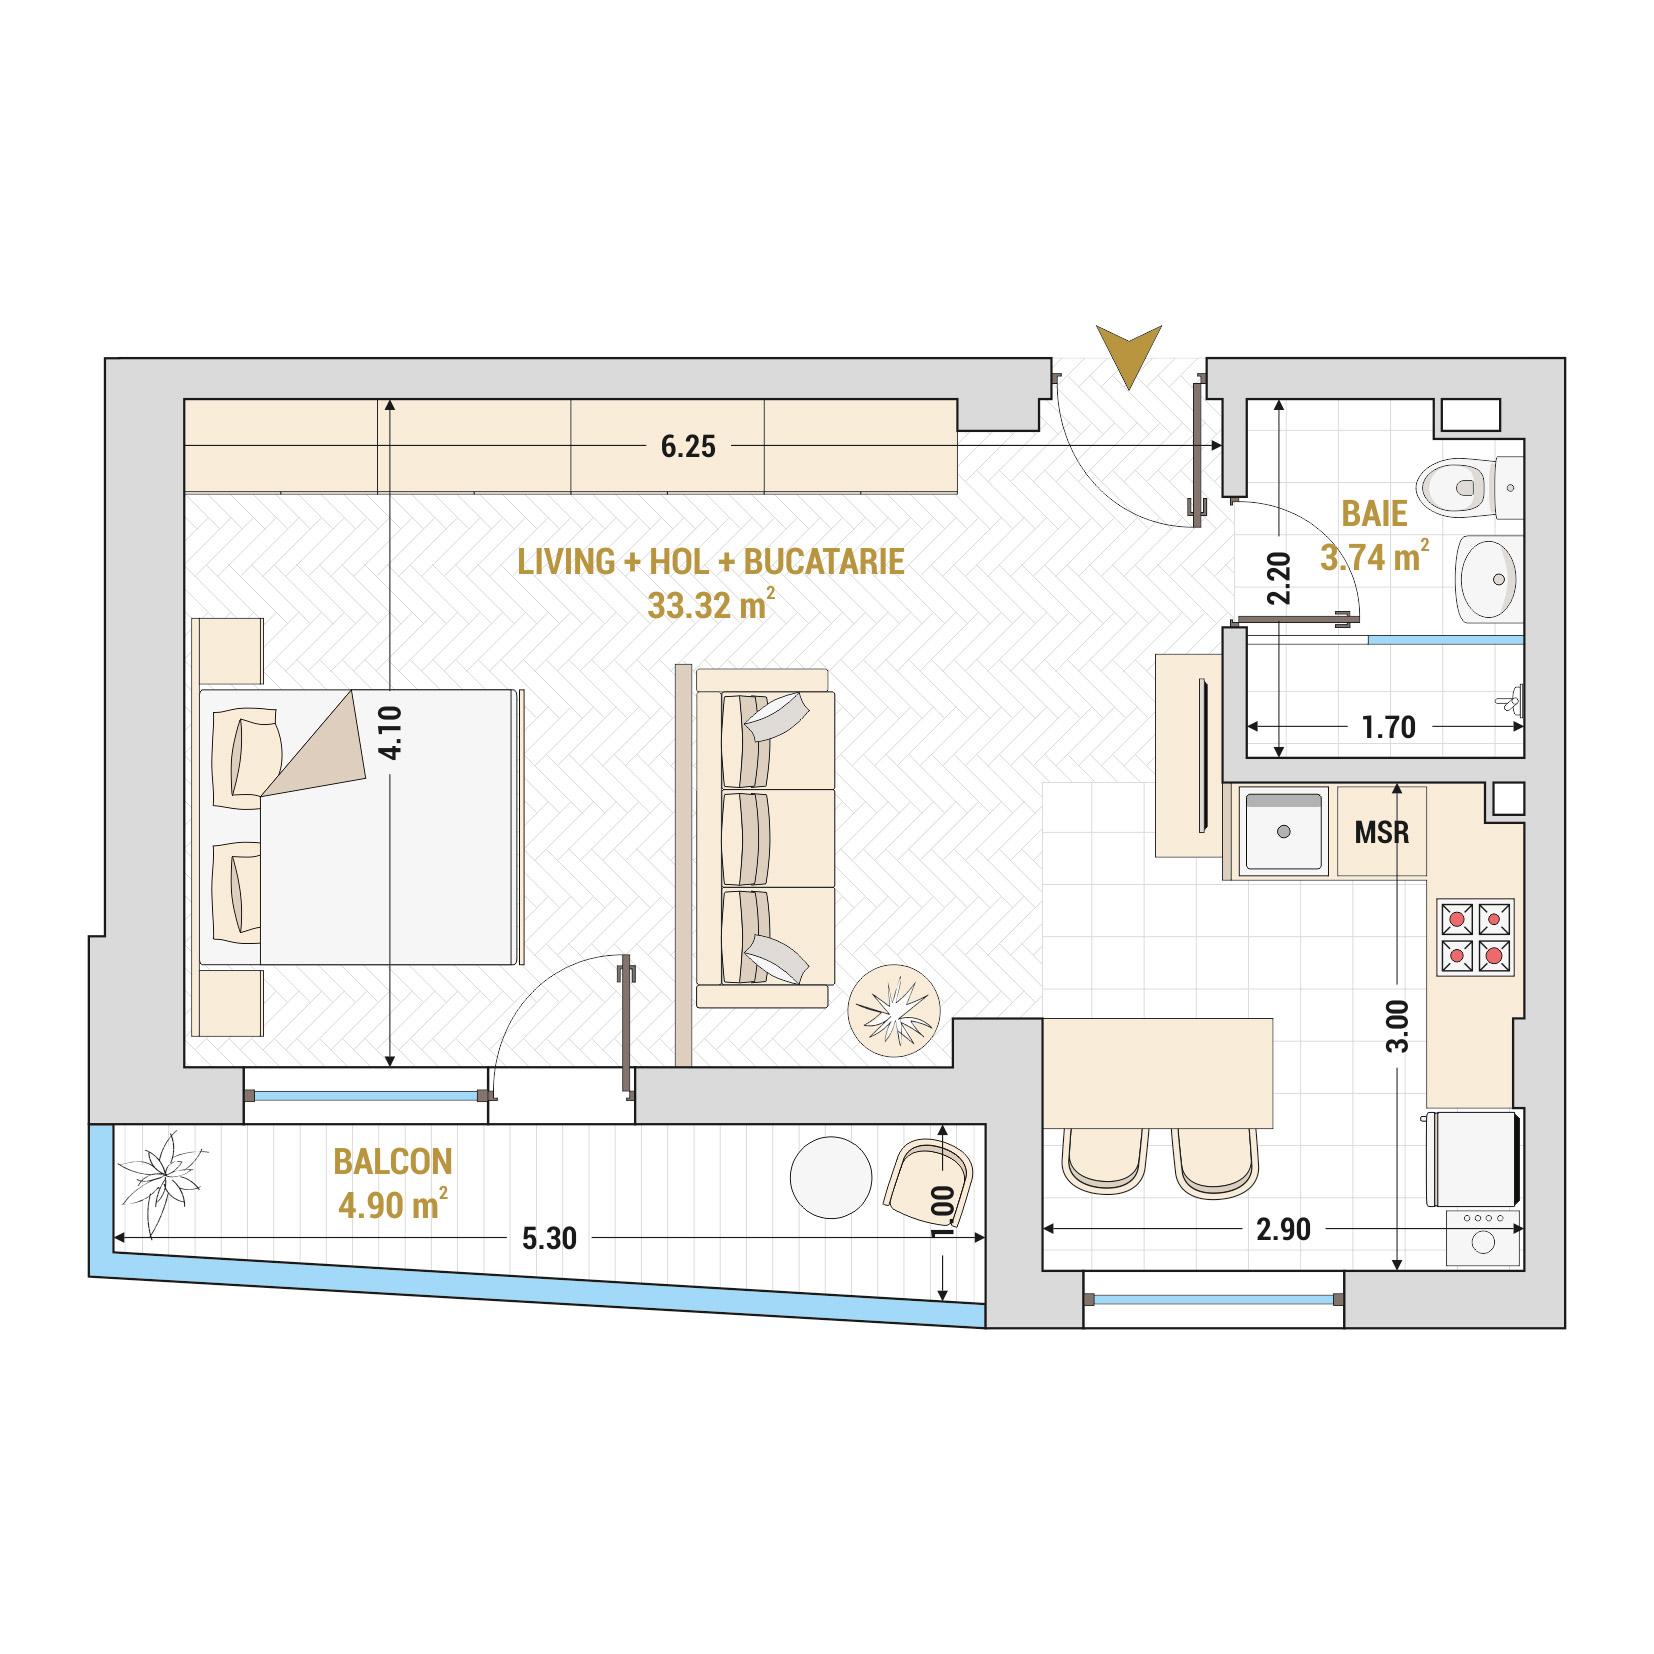 Garsoniere de vanzare Bucuresti - Catedral Residence - Marriott, Piata Unirii, 13 Septembrie, Izvor - Tip 3 - T1A